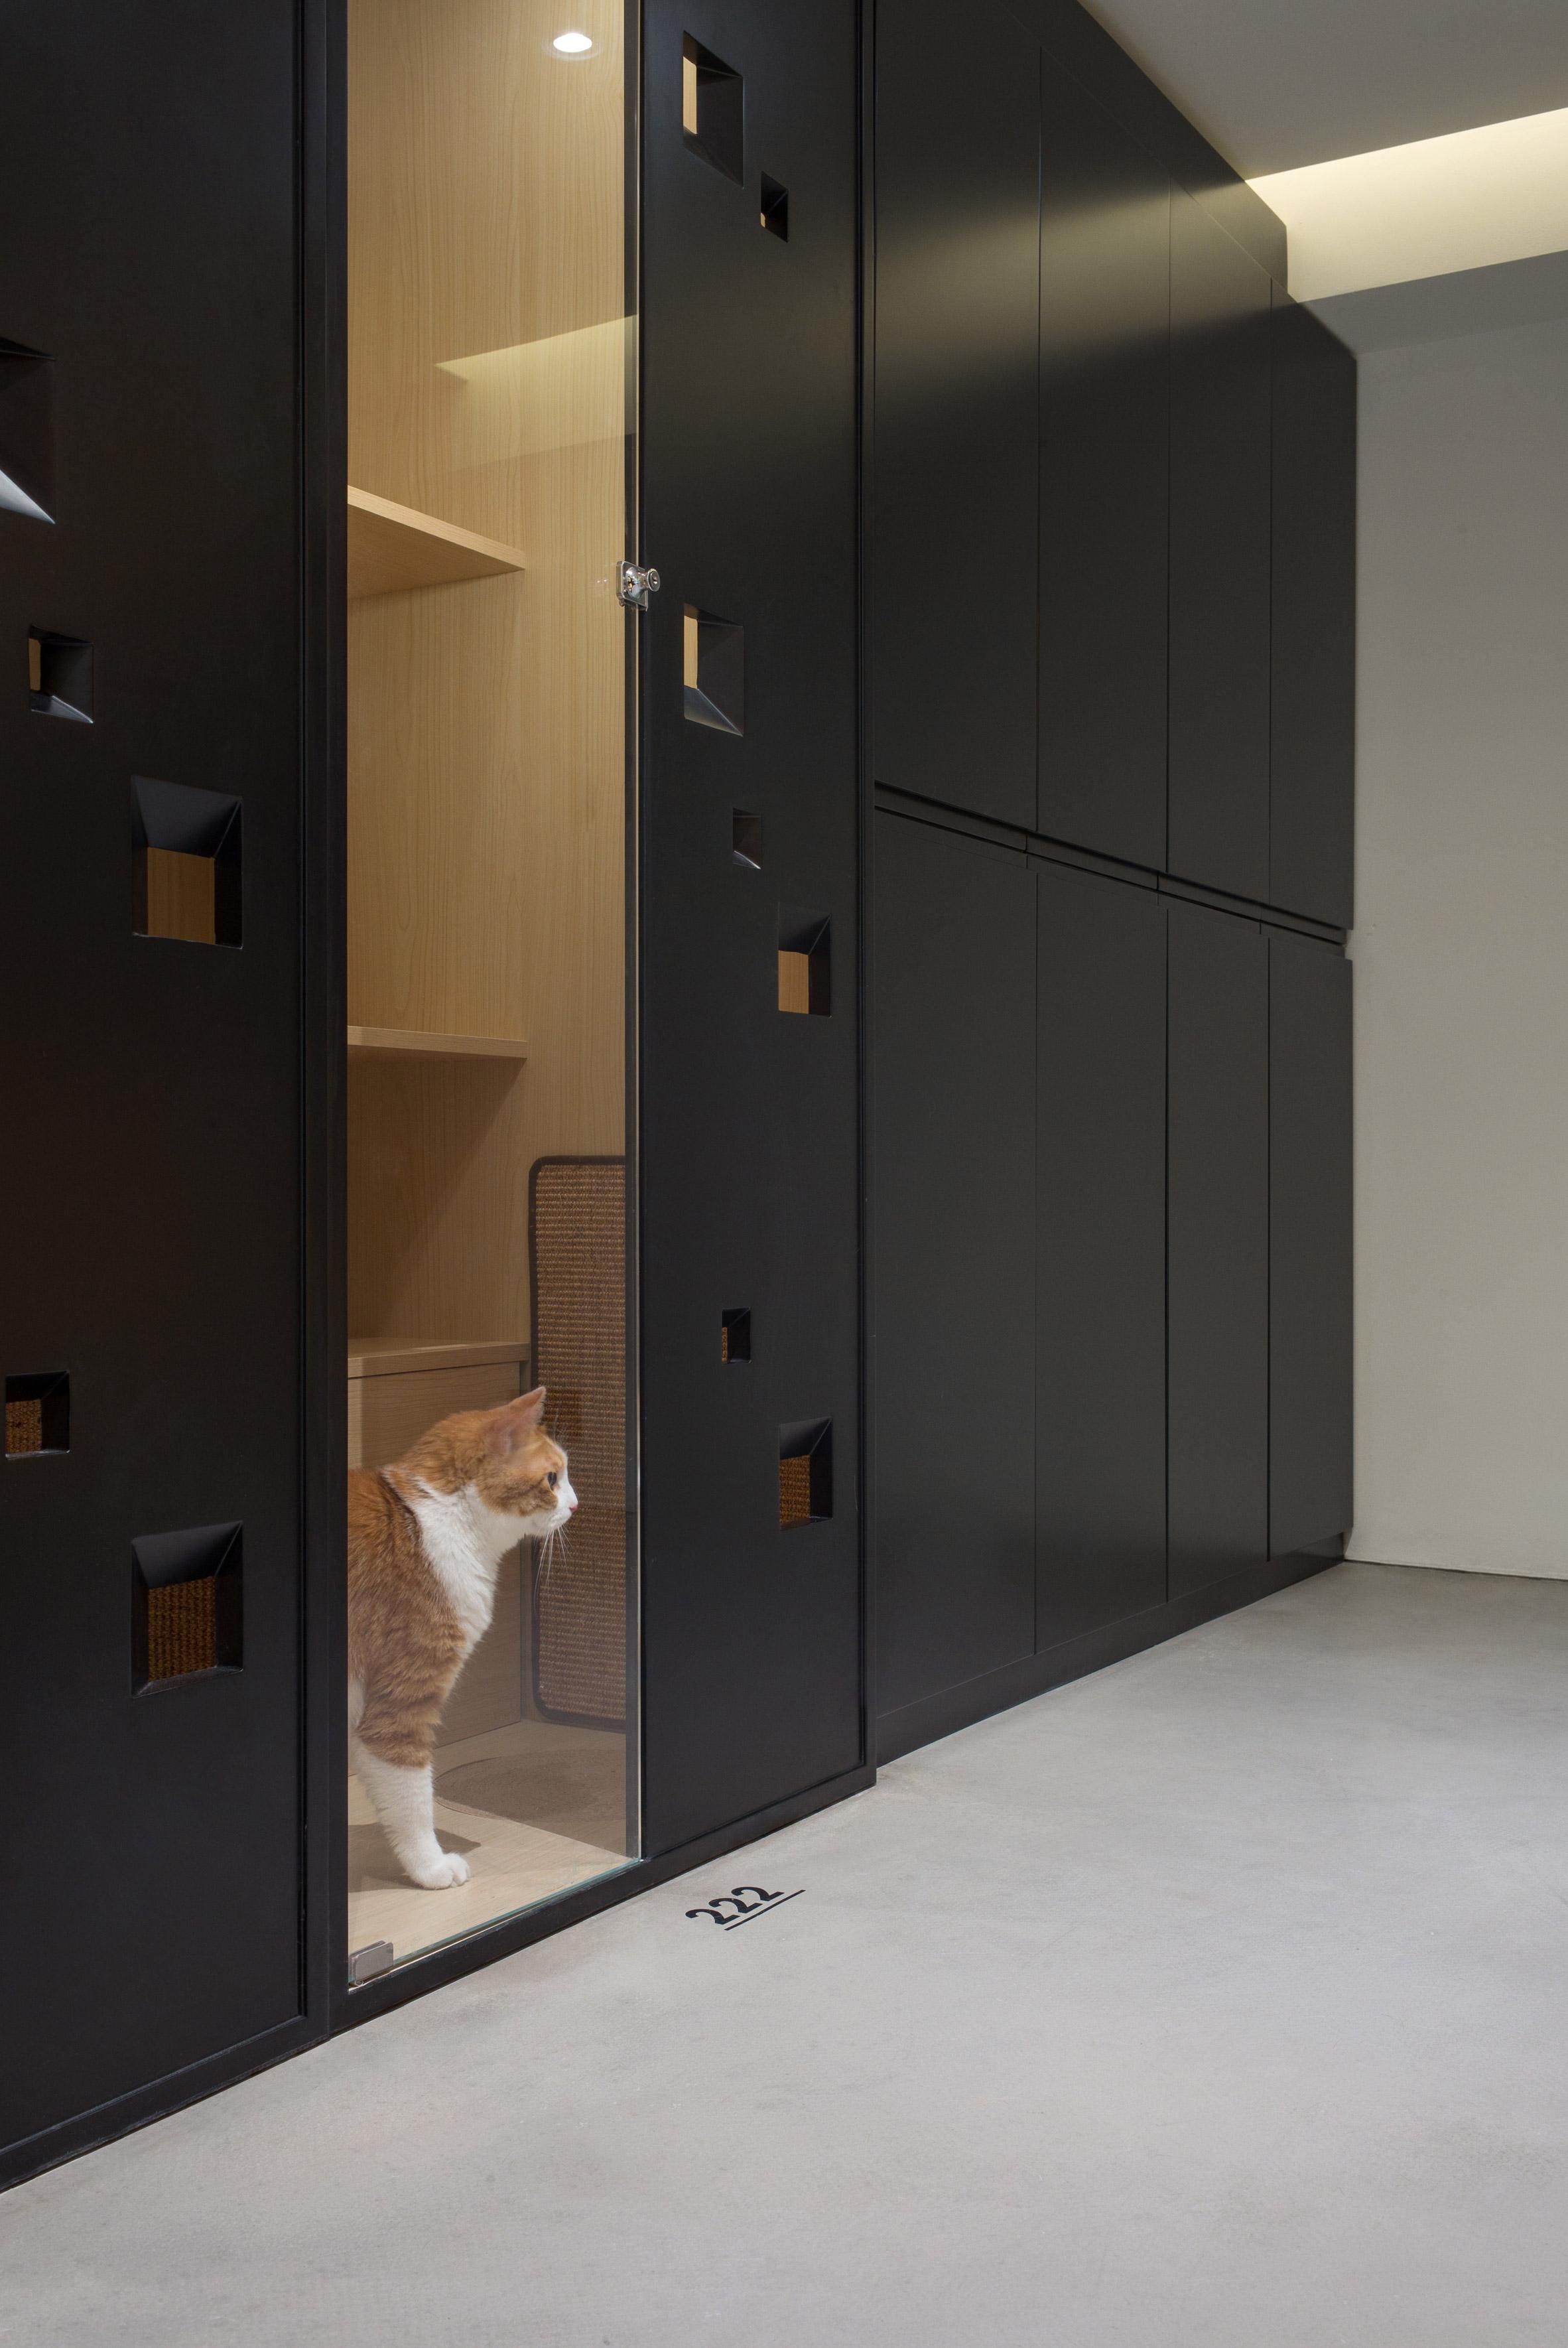 Nova Pets grooming salon by Say Architects